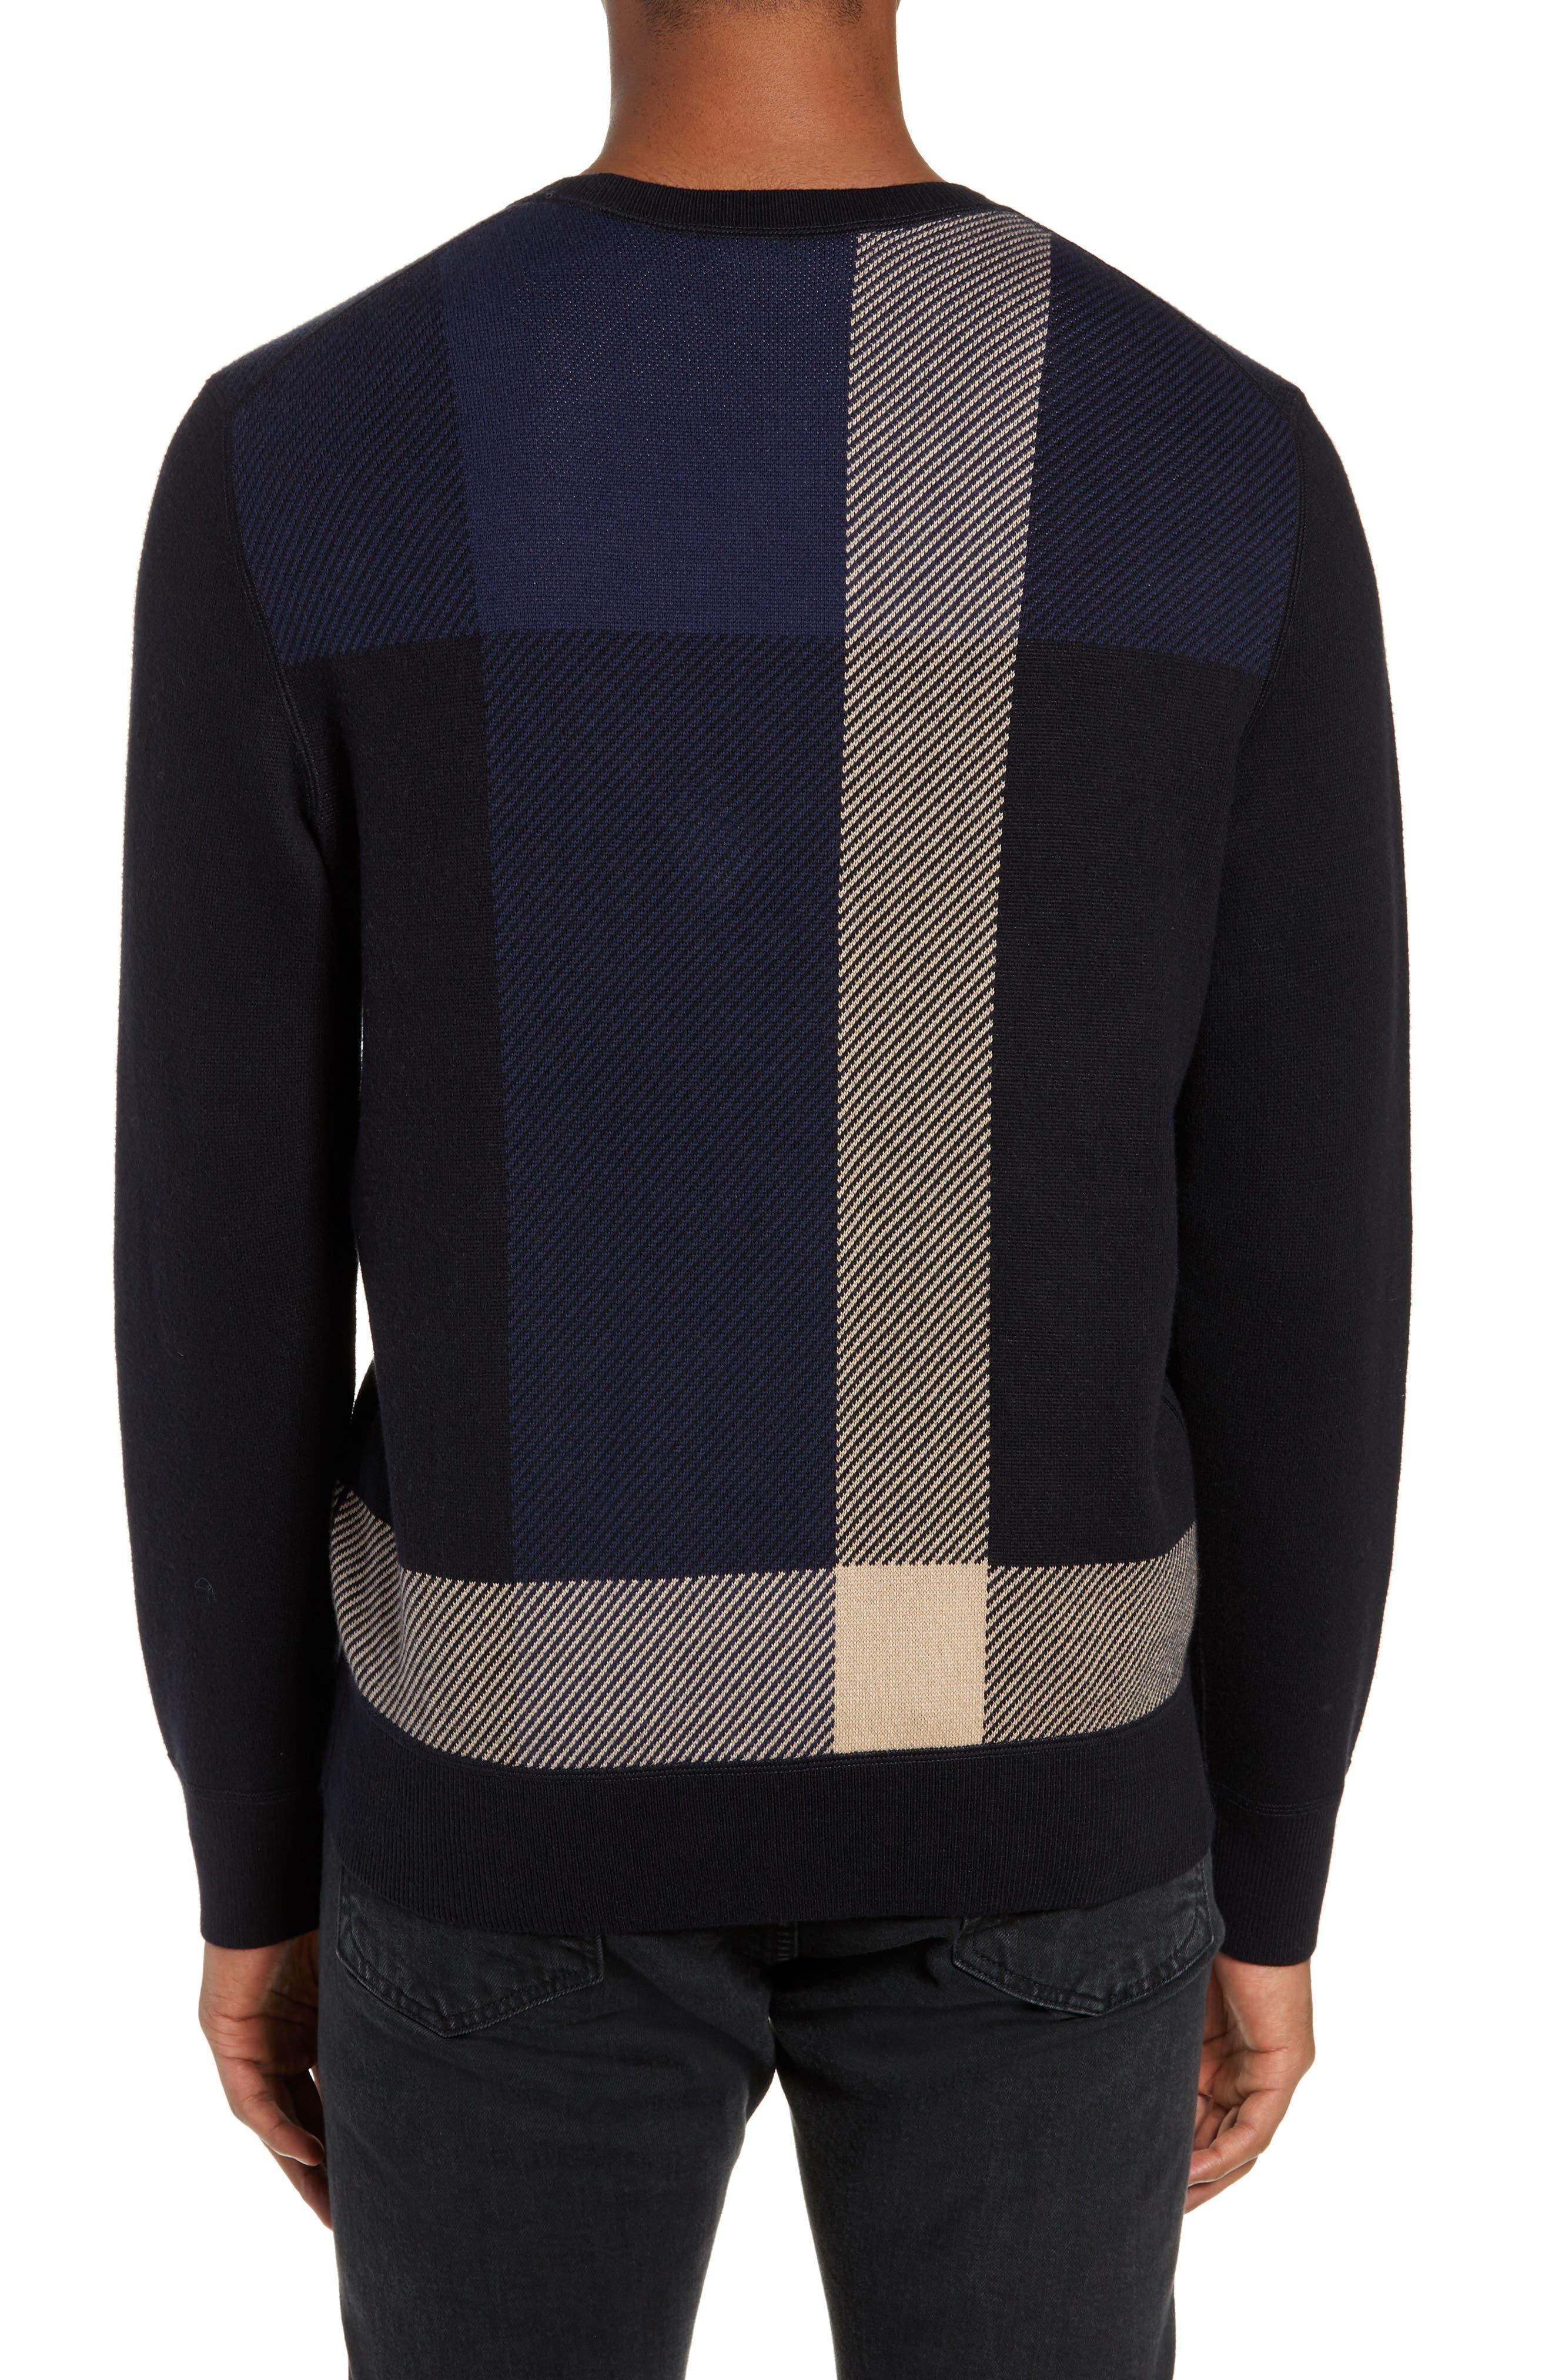 Marshall Crewneck Sweater,                             Alternate thumbnail 2, color,                             NAVY